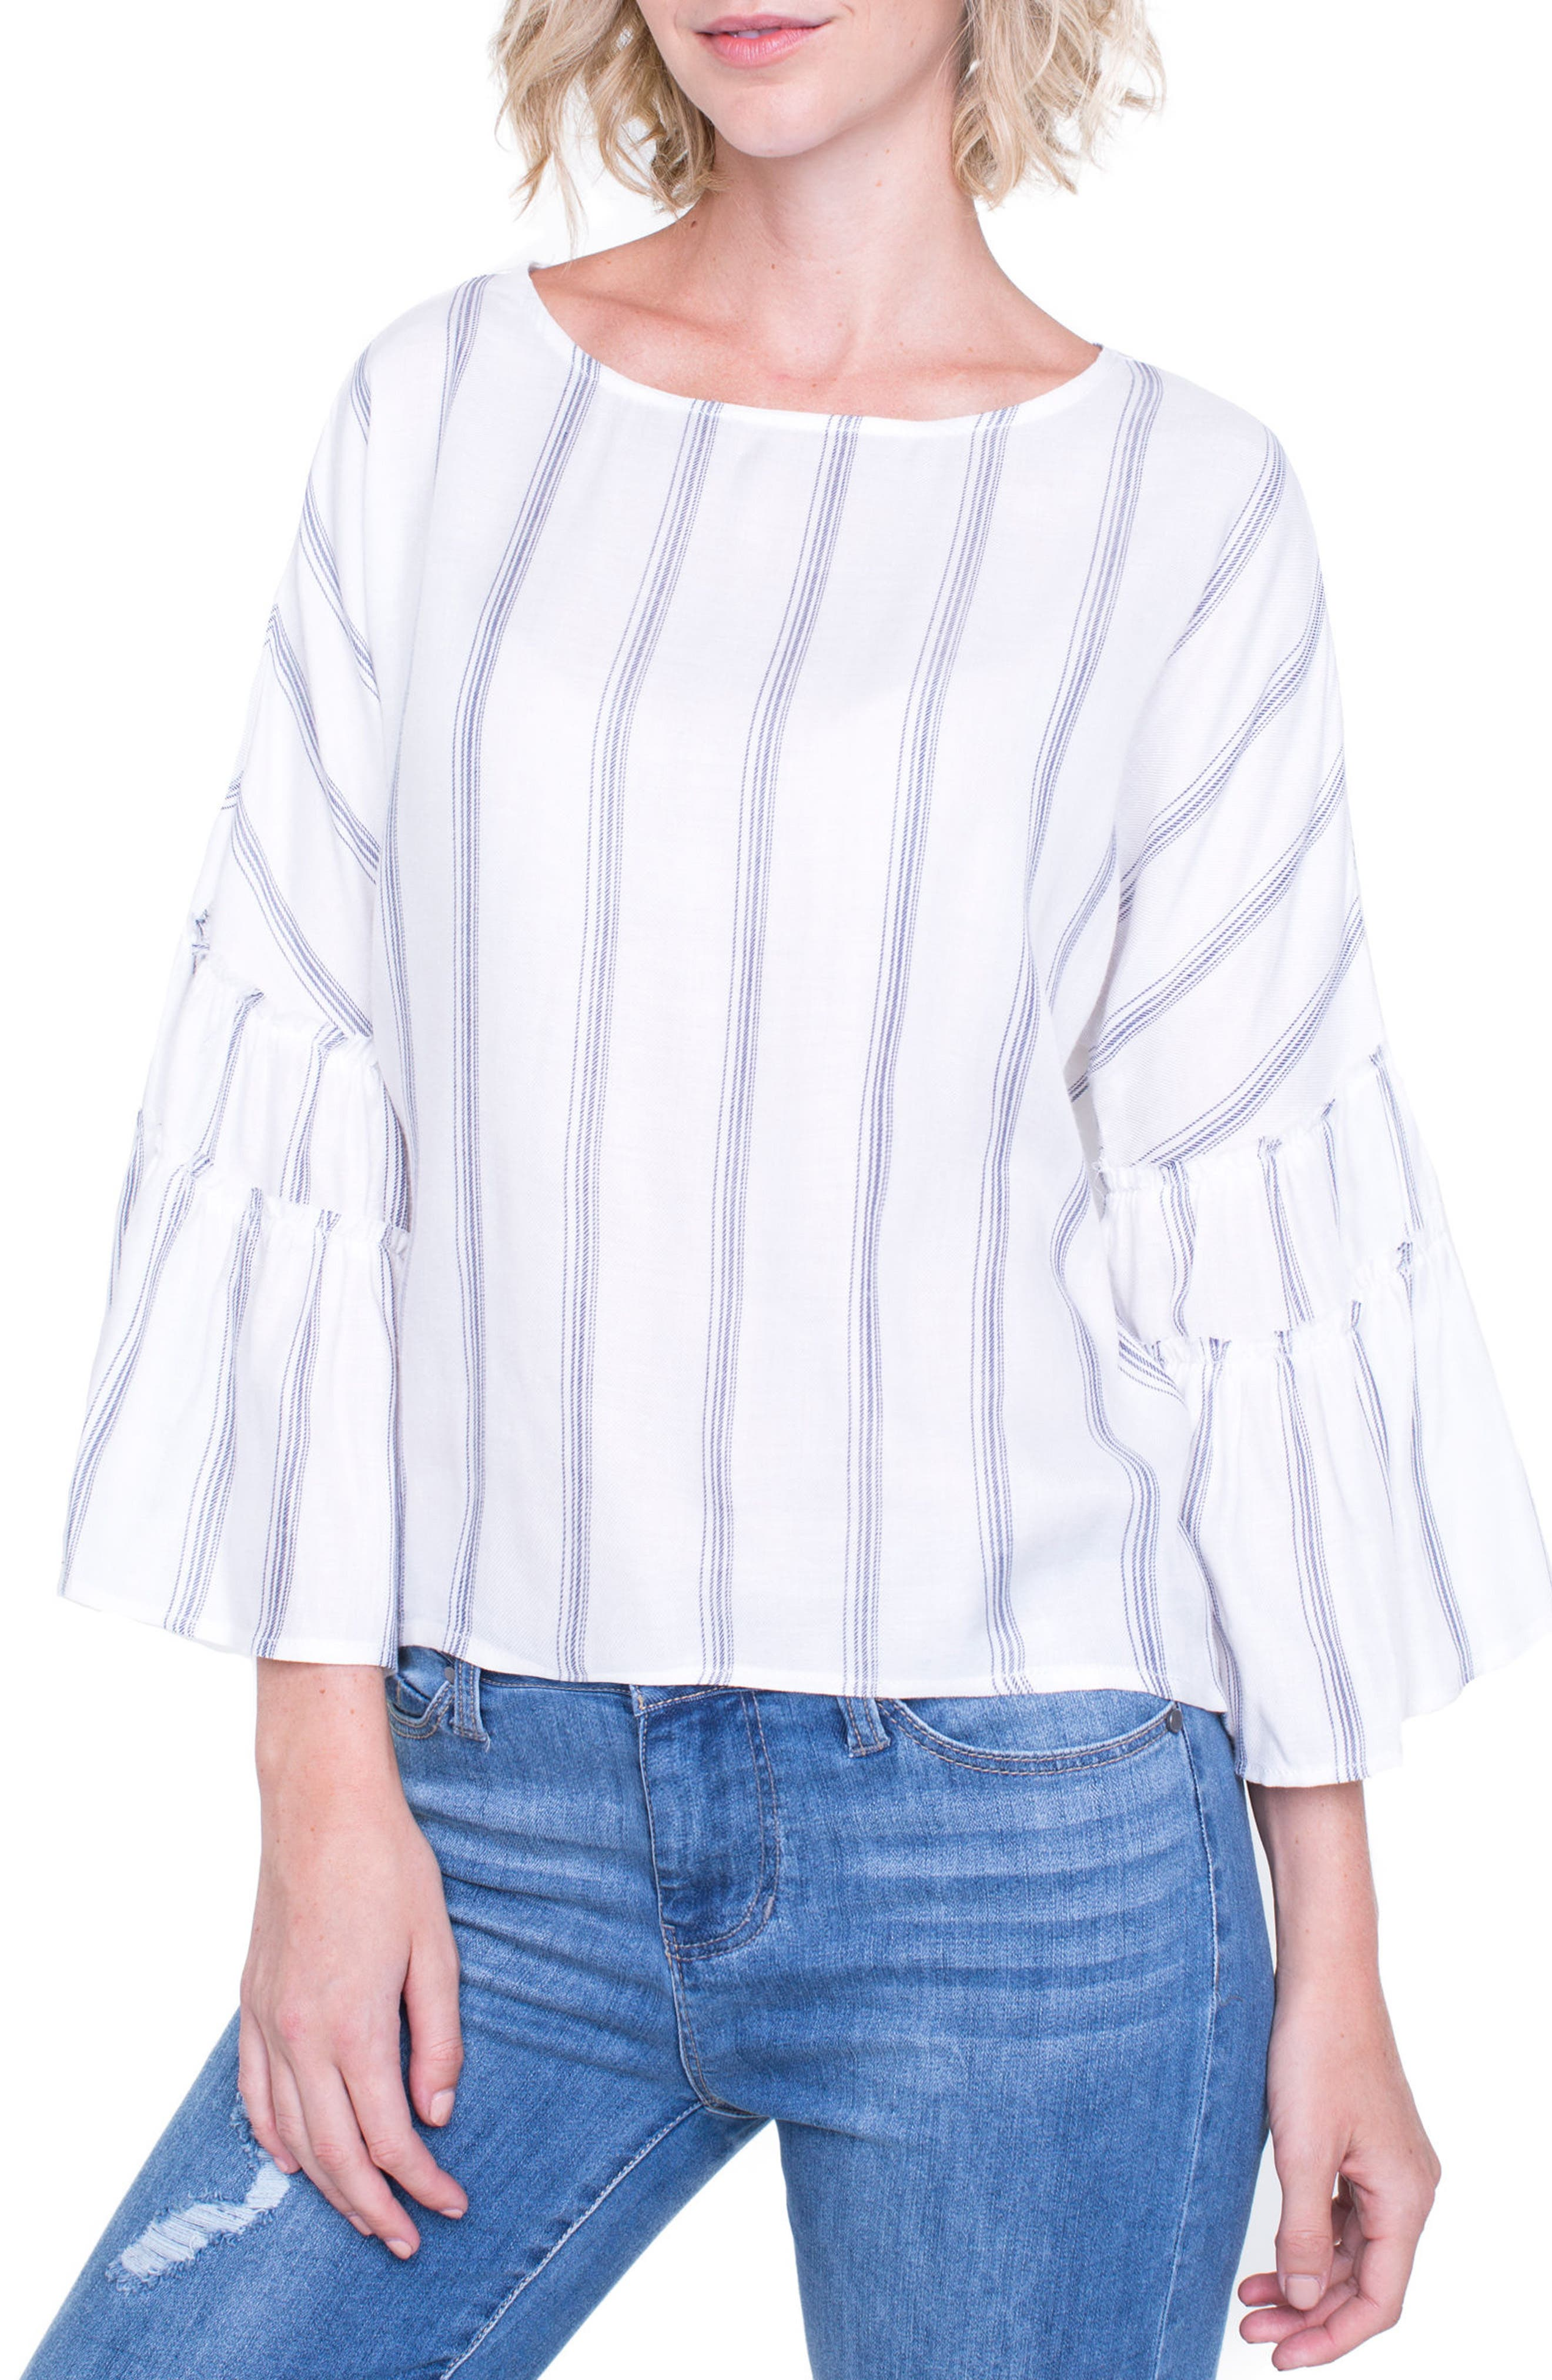 Liverpool Jeans Company Voluminous Sleeve Shirt